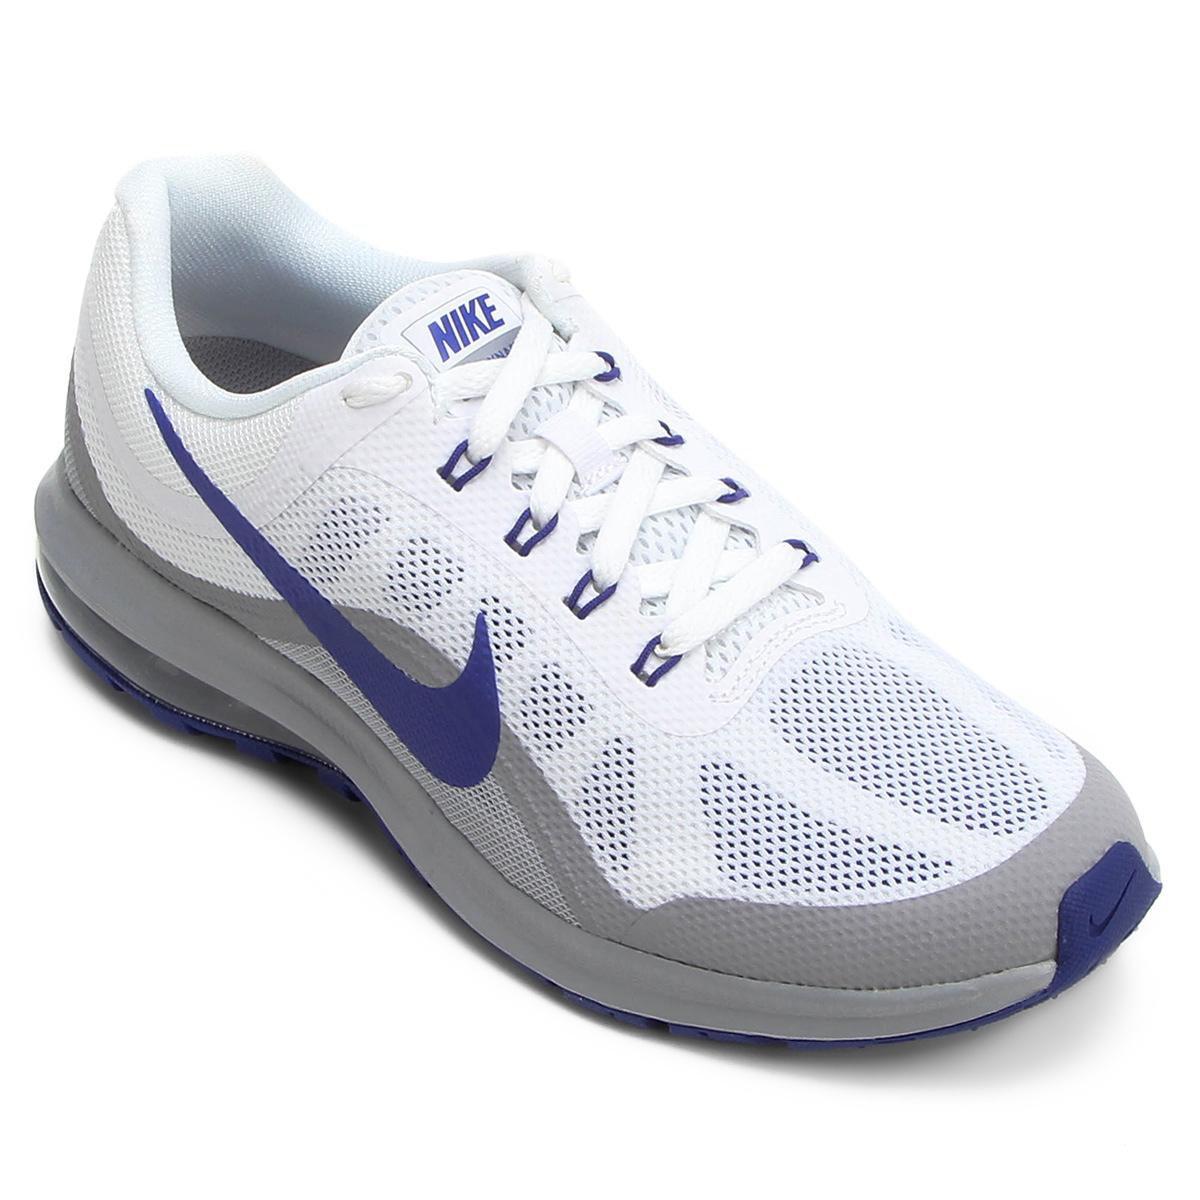 2bf7b3b618b Tênis Nike Air Max Dynasty 2 Masculino - Compre Agora